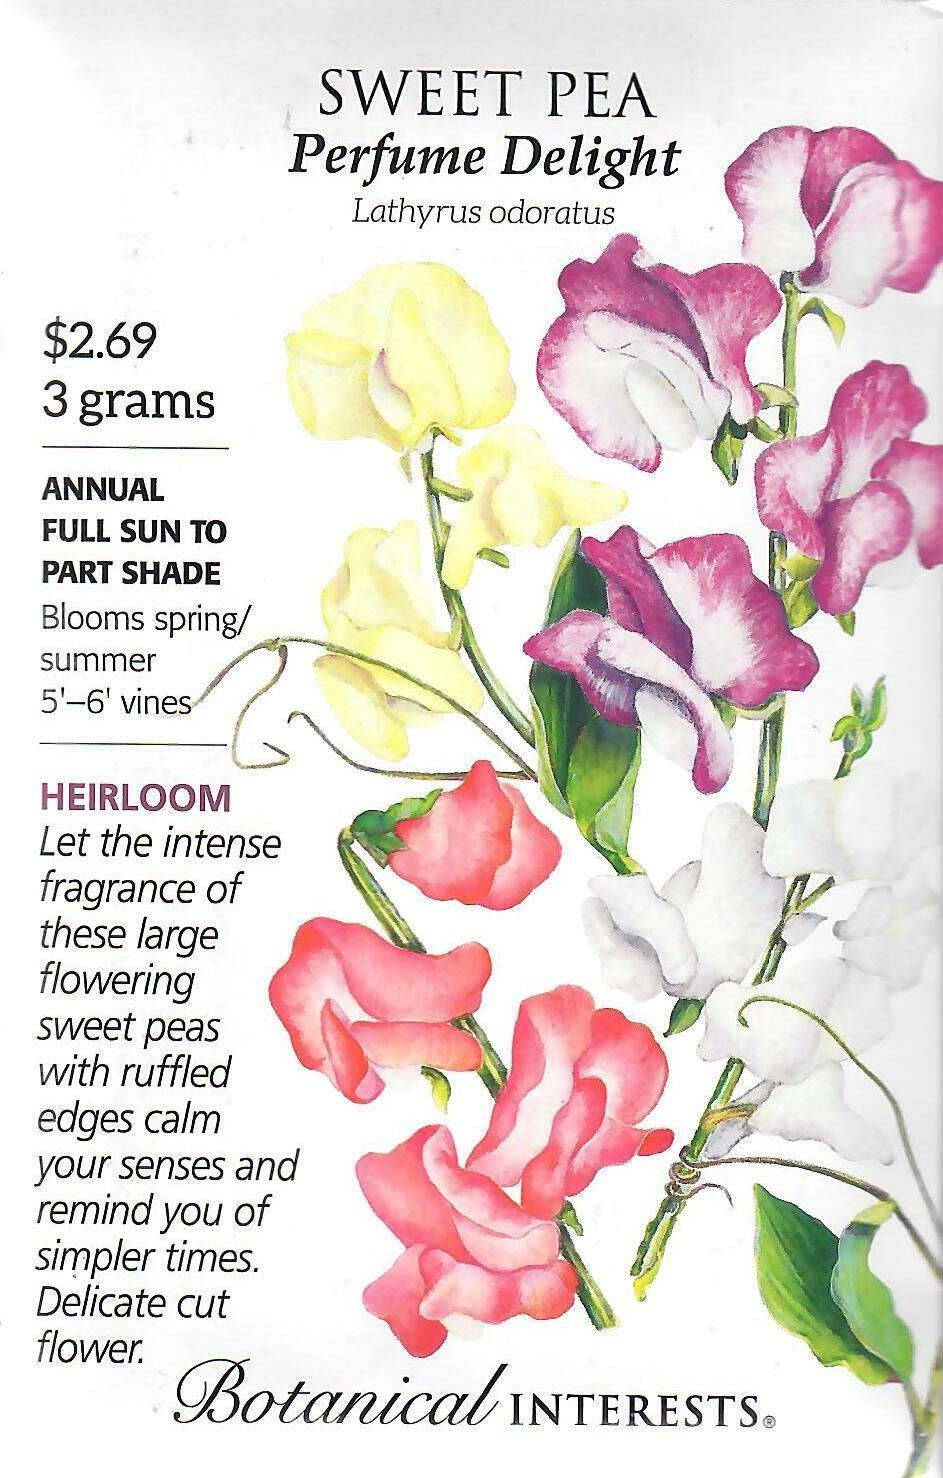 Sweet Pea Perfume Delight Blend Botanical Interests